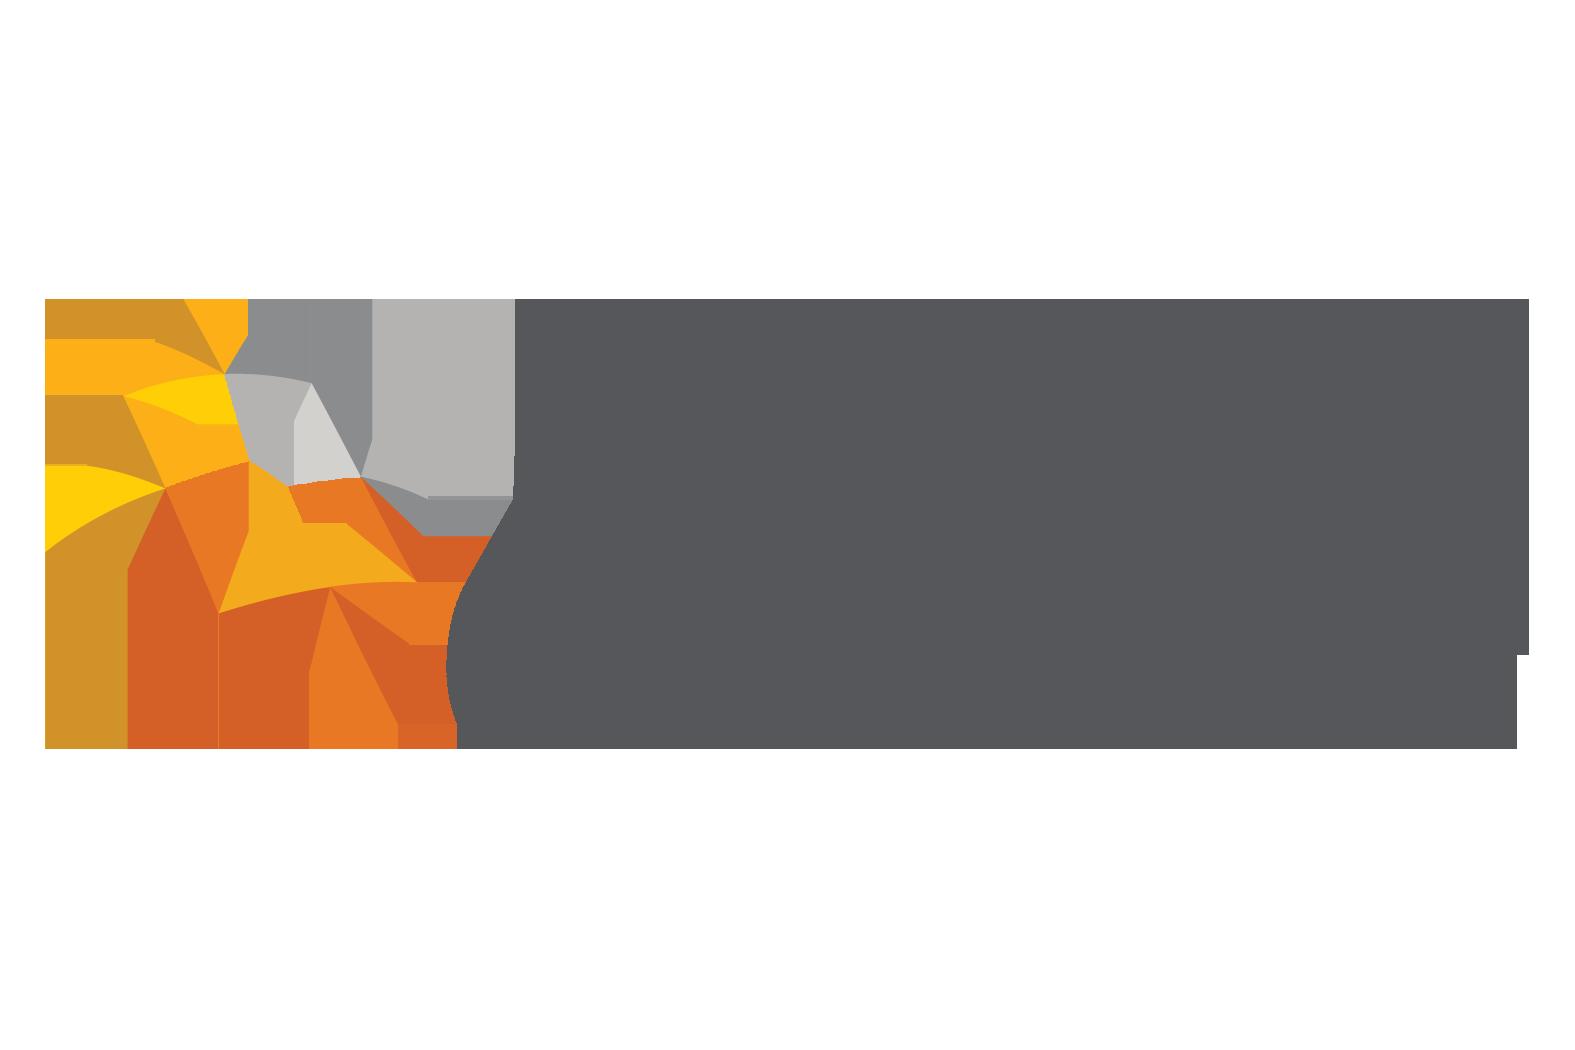 OPTUM_RGB.png